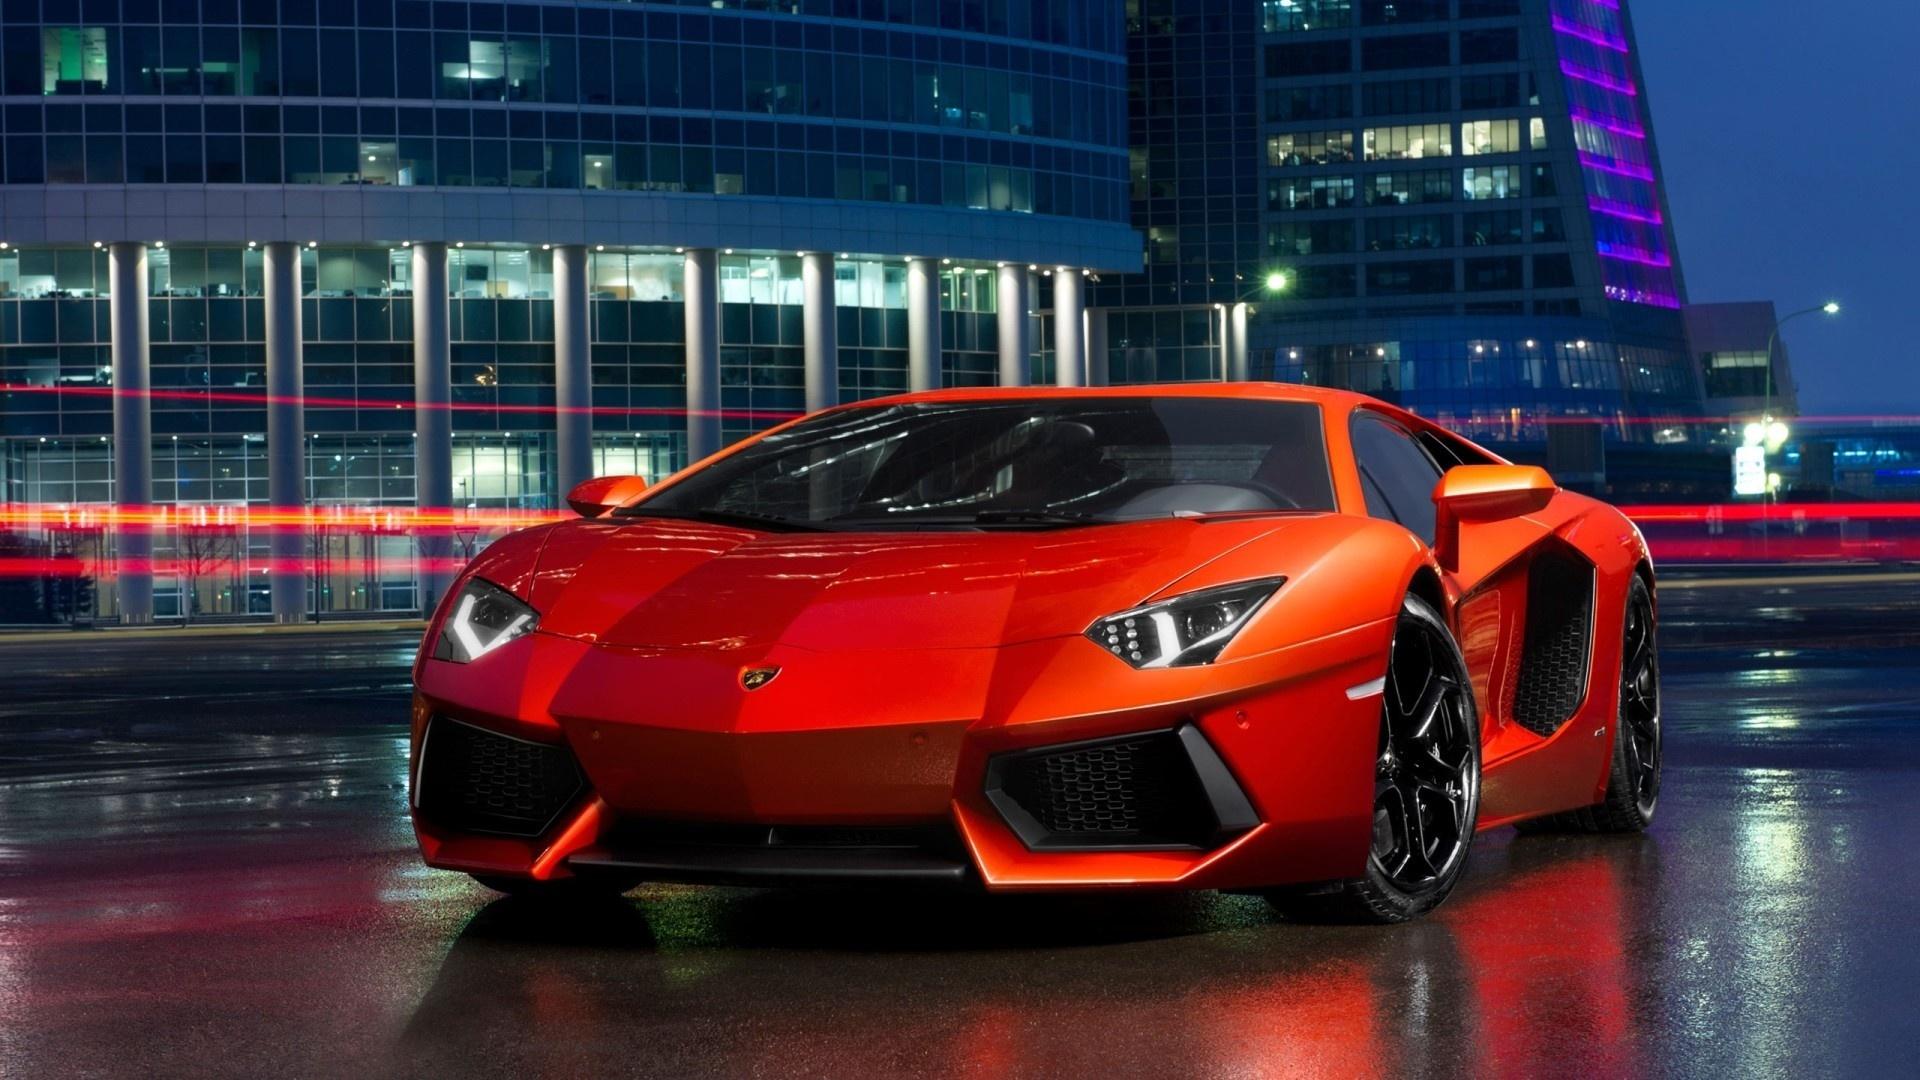 Lamborghini free photo